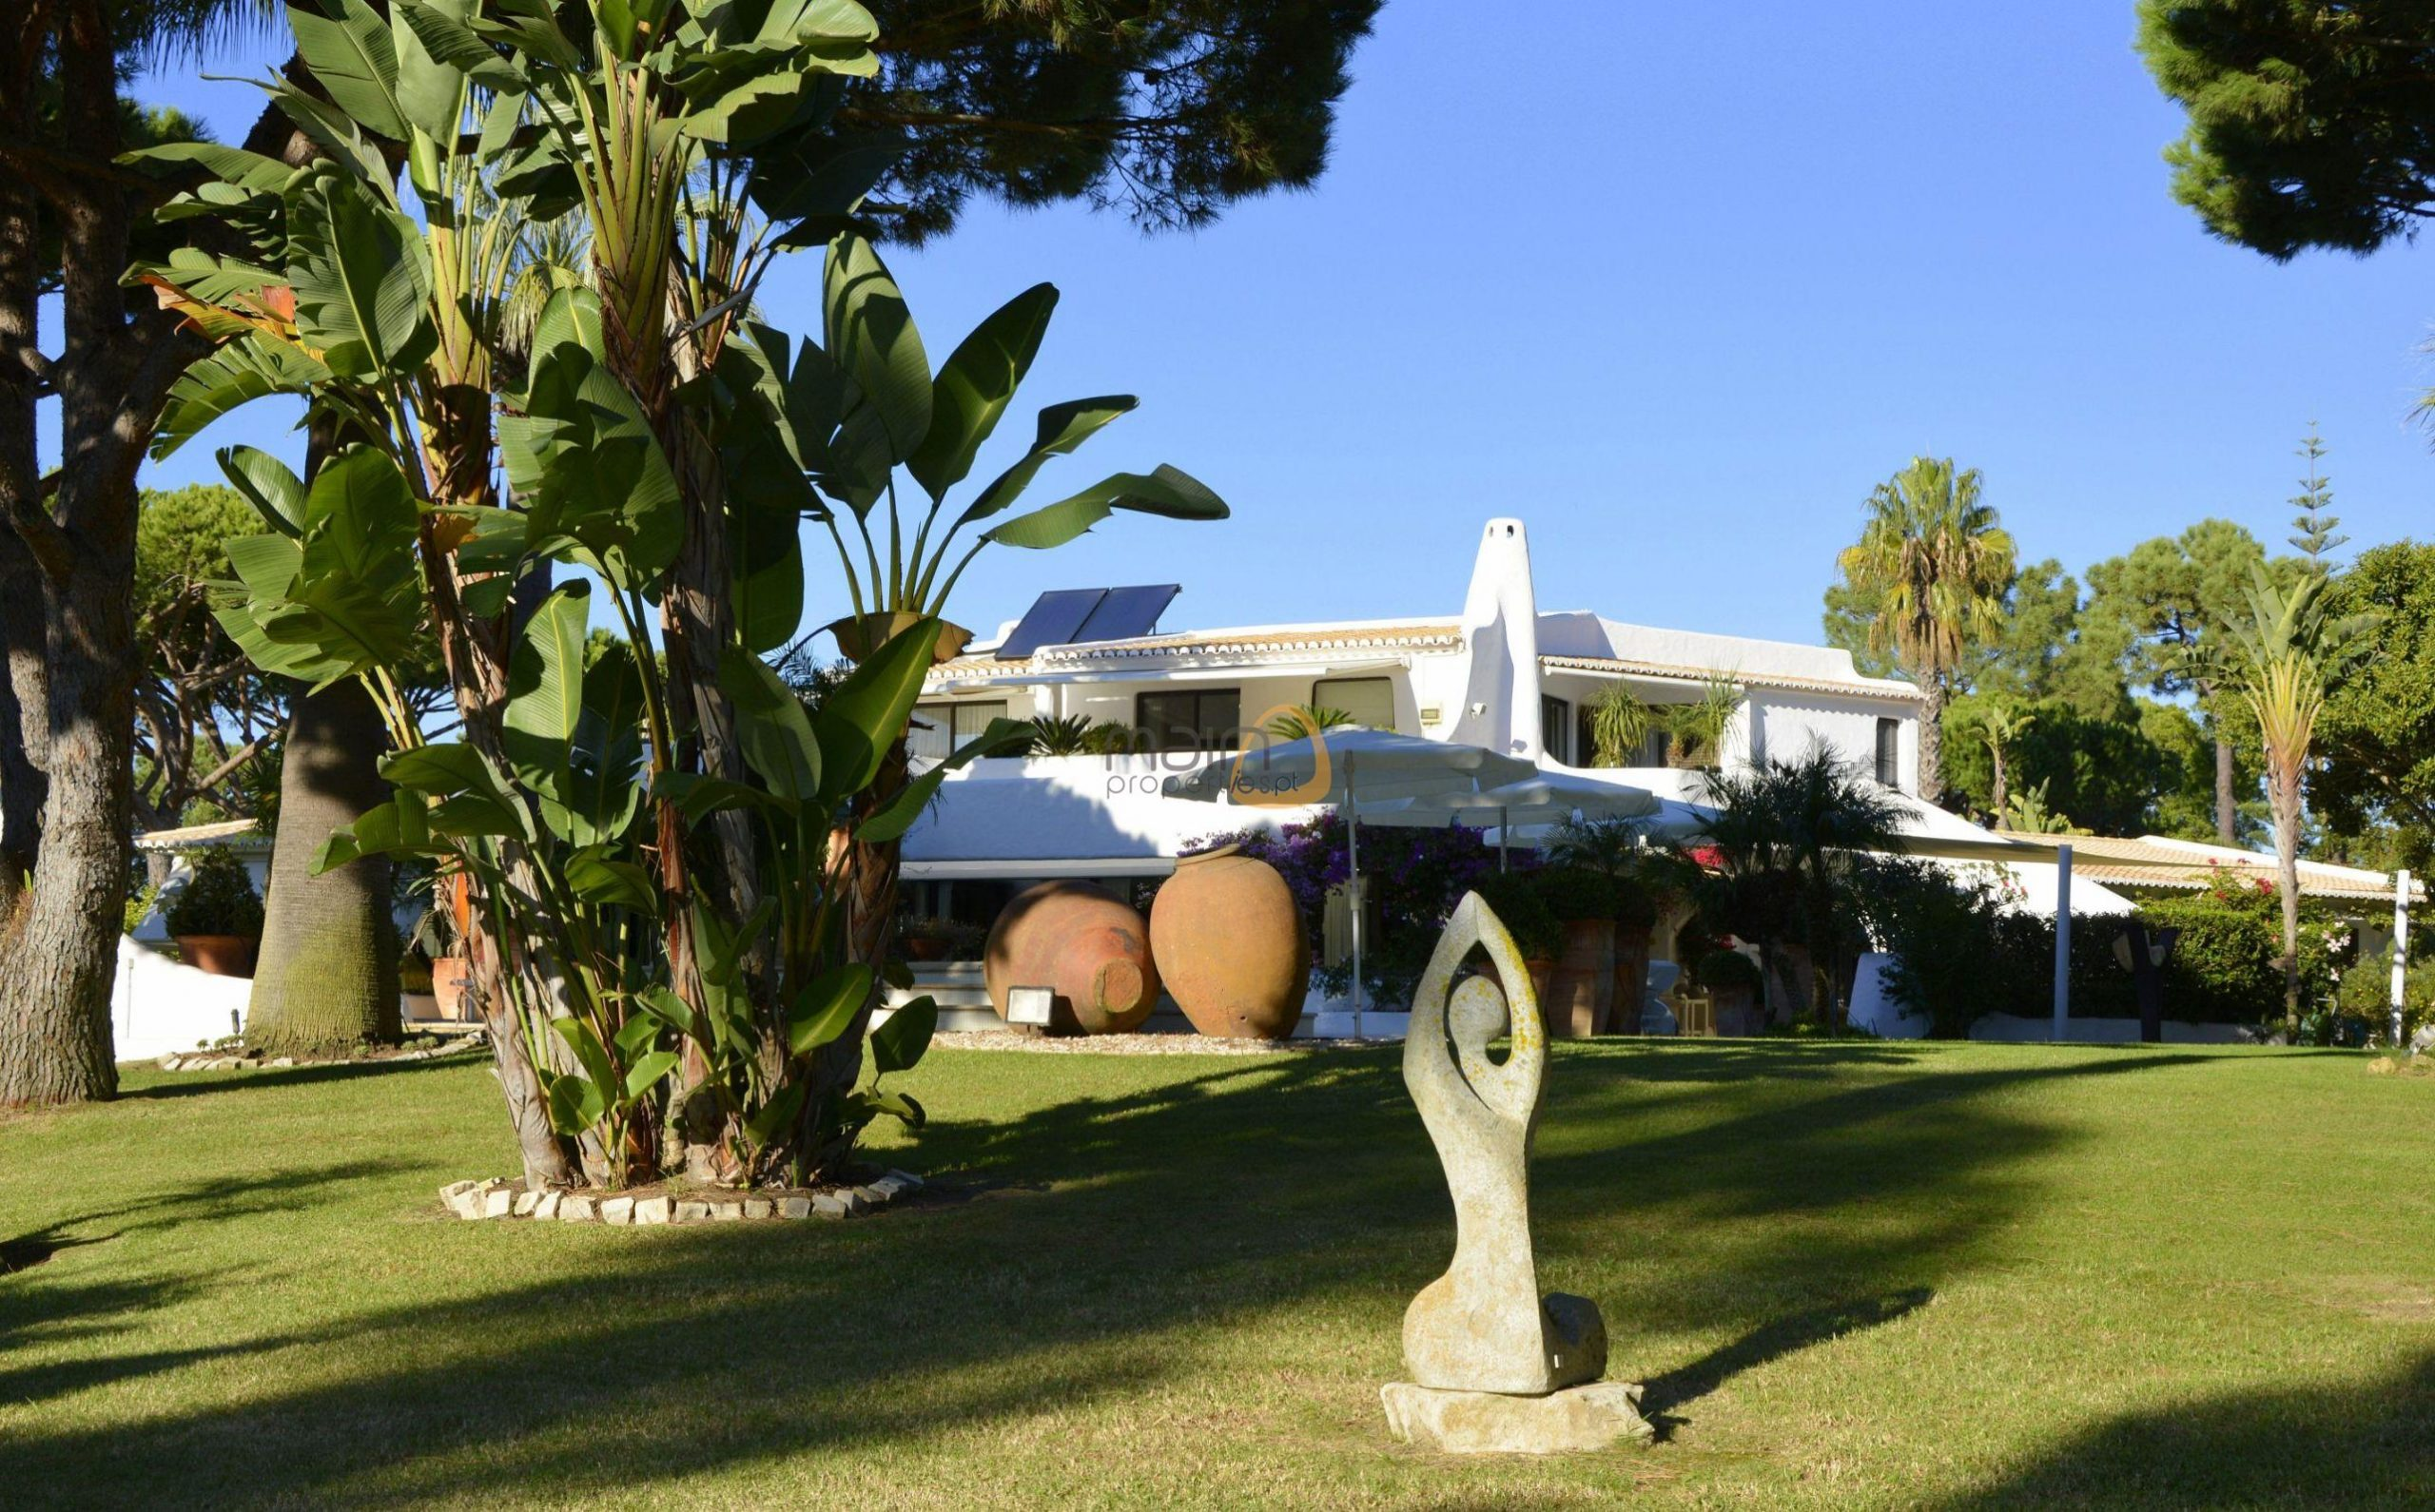 [:pt]Moradia com 5 quartos na Quinta do Lago :: Jardim 3 :: MainProperties :: 020061[:en]5 bedroom villa in Quinta do Lago :: Garden 2 :: MainProperties :: 020061[:]